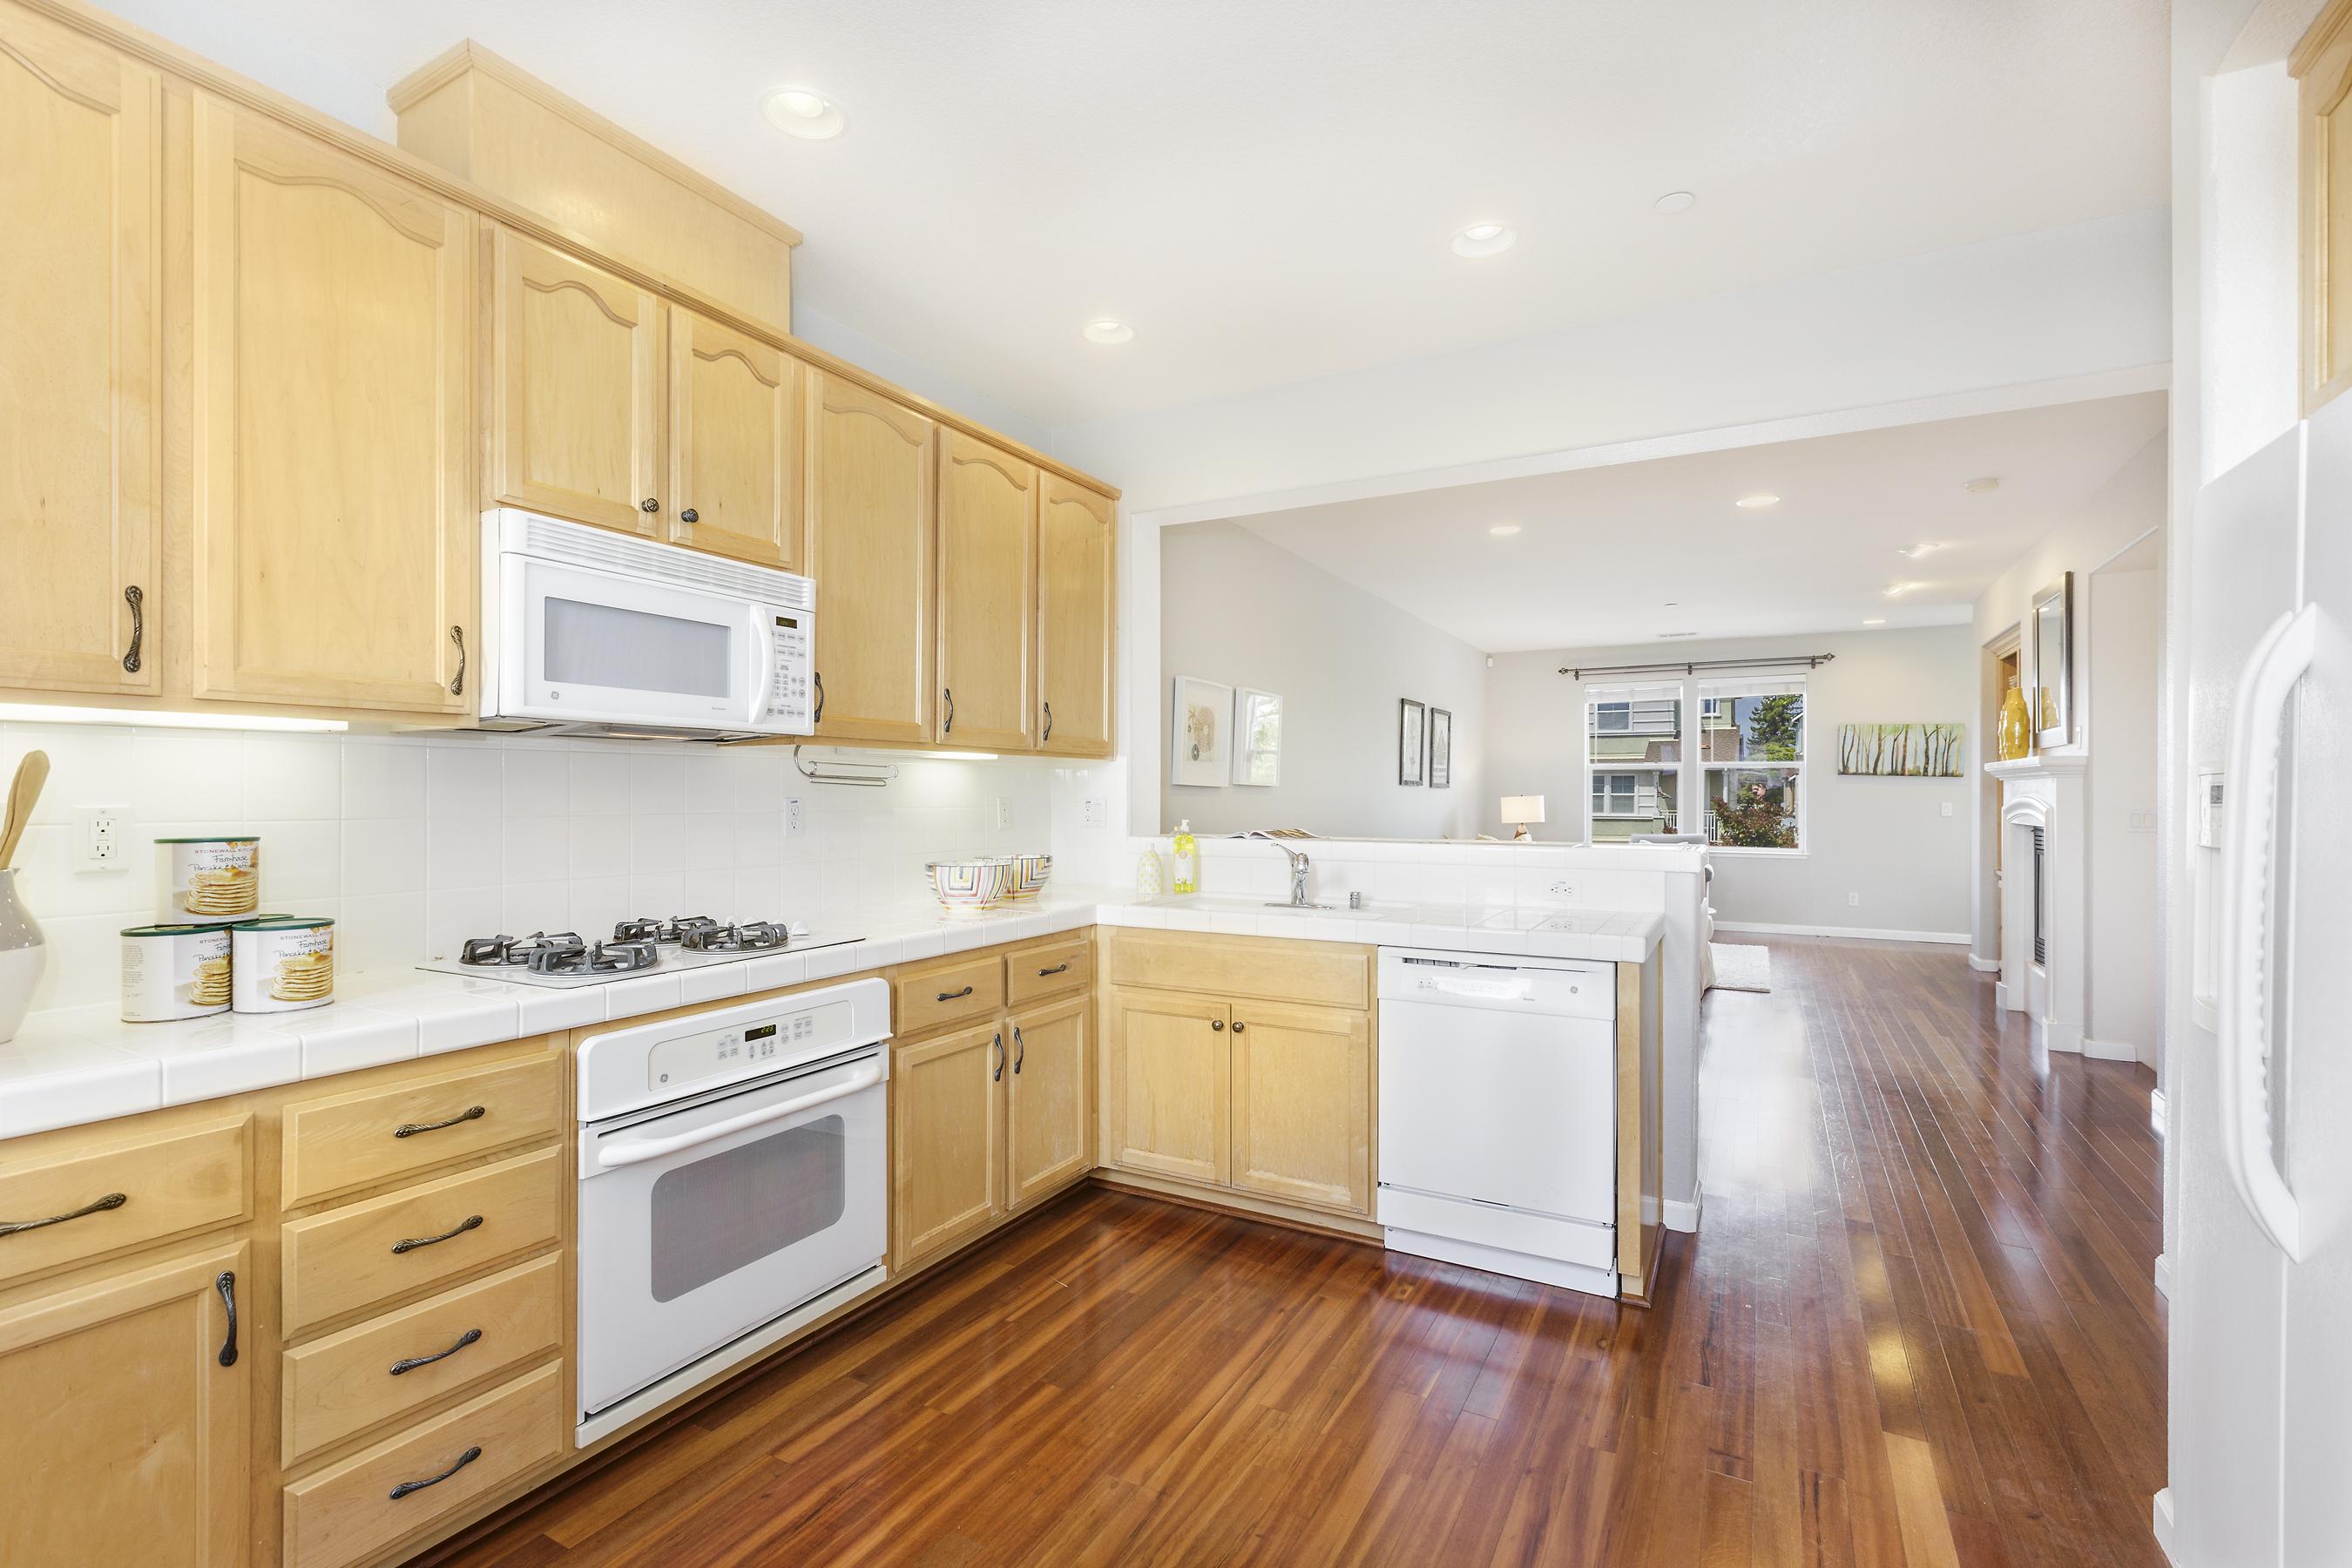 08-2225-Sea-Hero-kitchen-high-res